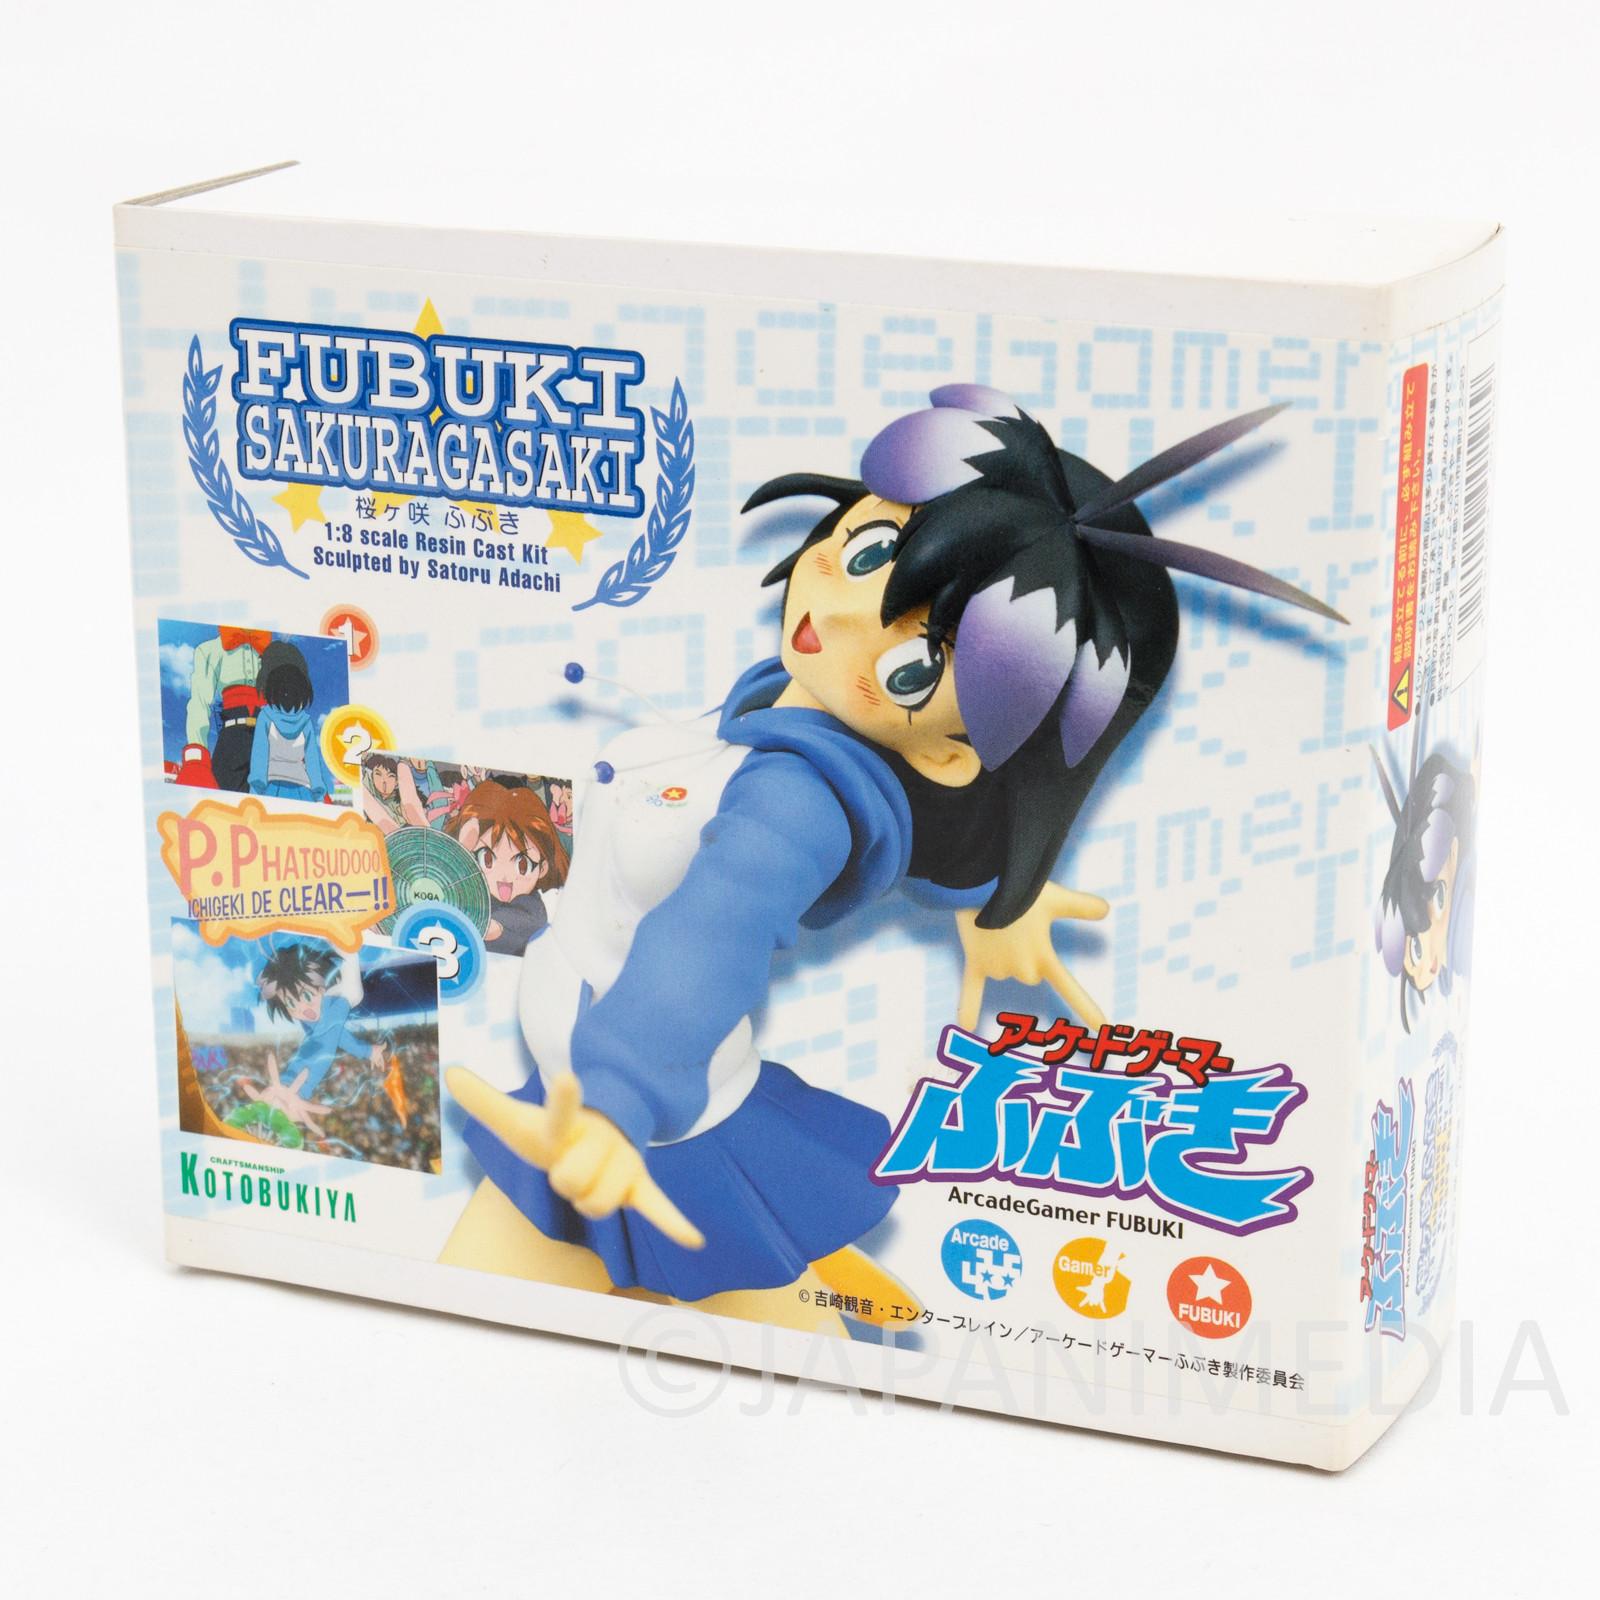 Arcade Gamer Fubuki Sakuragasaki 1/8 Scale Resin Cast Model Kit JAPAN MANGA